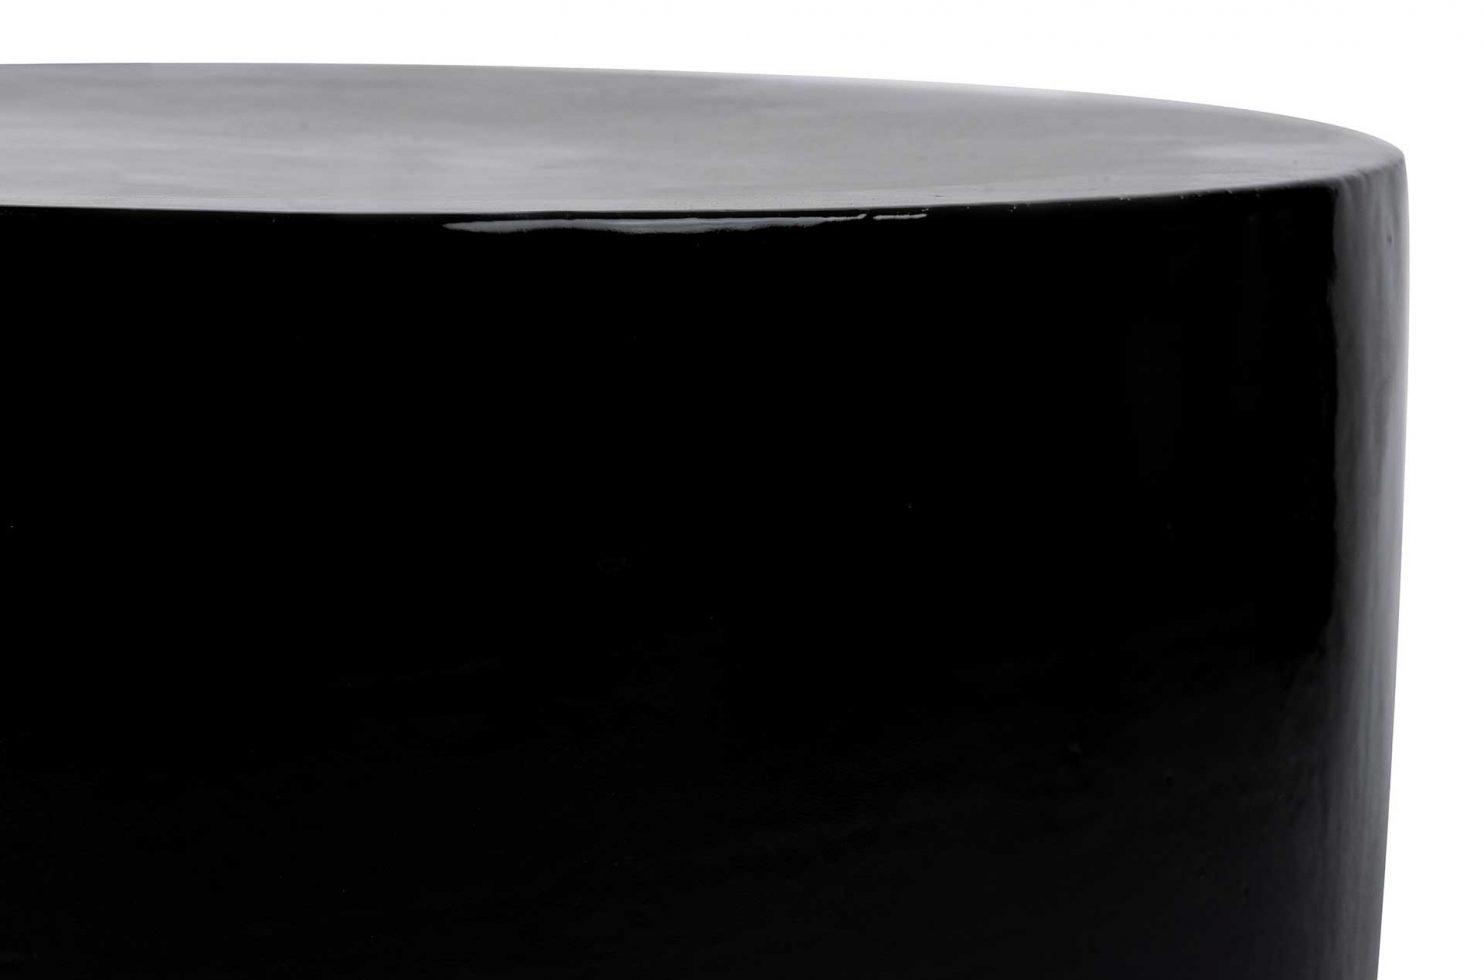 prov cer serenity side table 20in C3080152132 jet coal dtl1 web